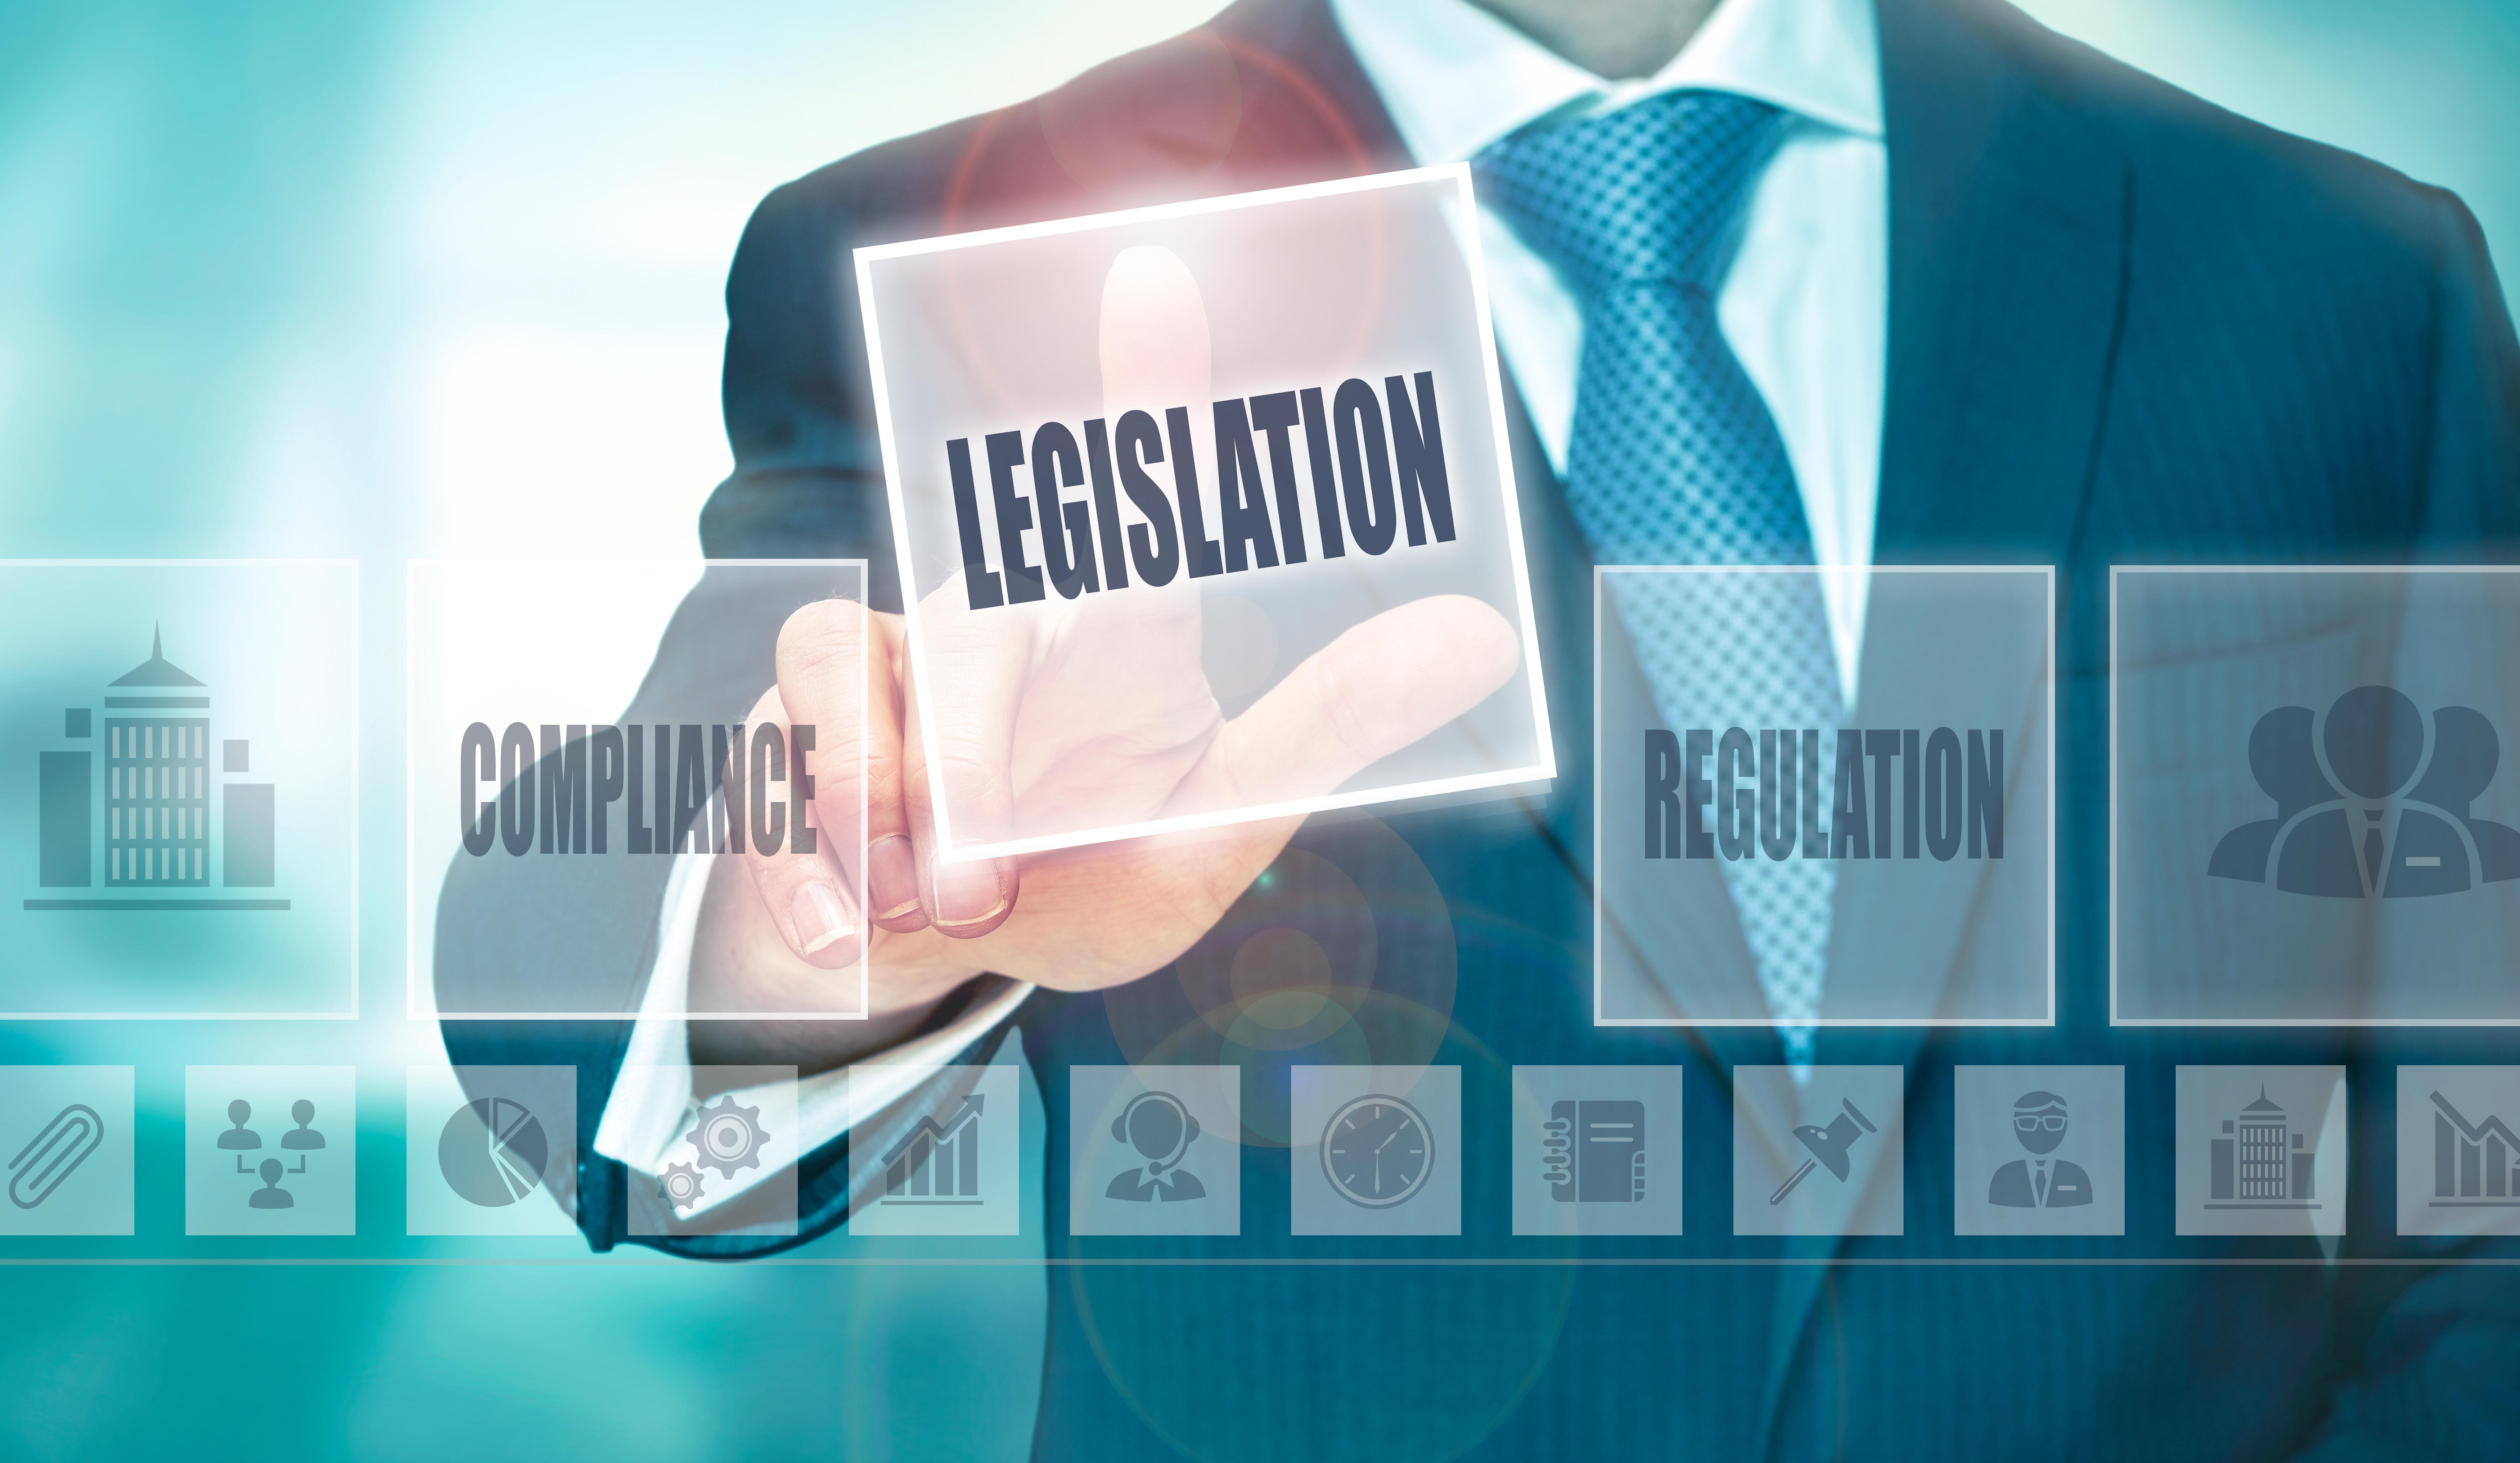 Legislation and HR Training